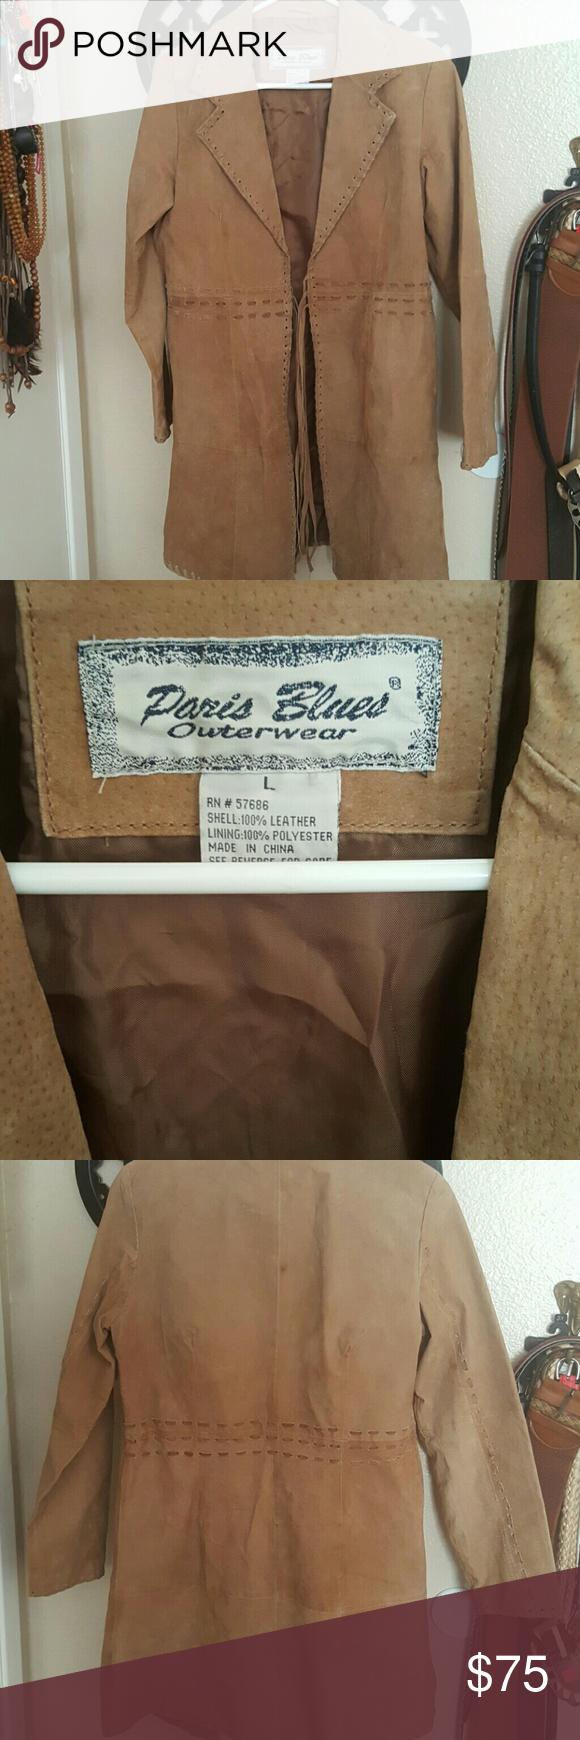 Paris Blues Pocahontas Leather Jacket Cool Good Condition Vintage Look Tan Leather Tie Tassels Size Large Paris Blues J Leather Jacket Jackets Blue Jacket [ 1740 x 580 Pixel ]